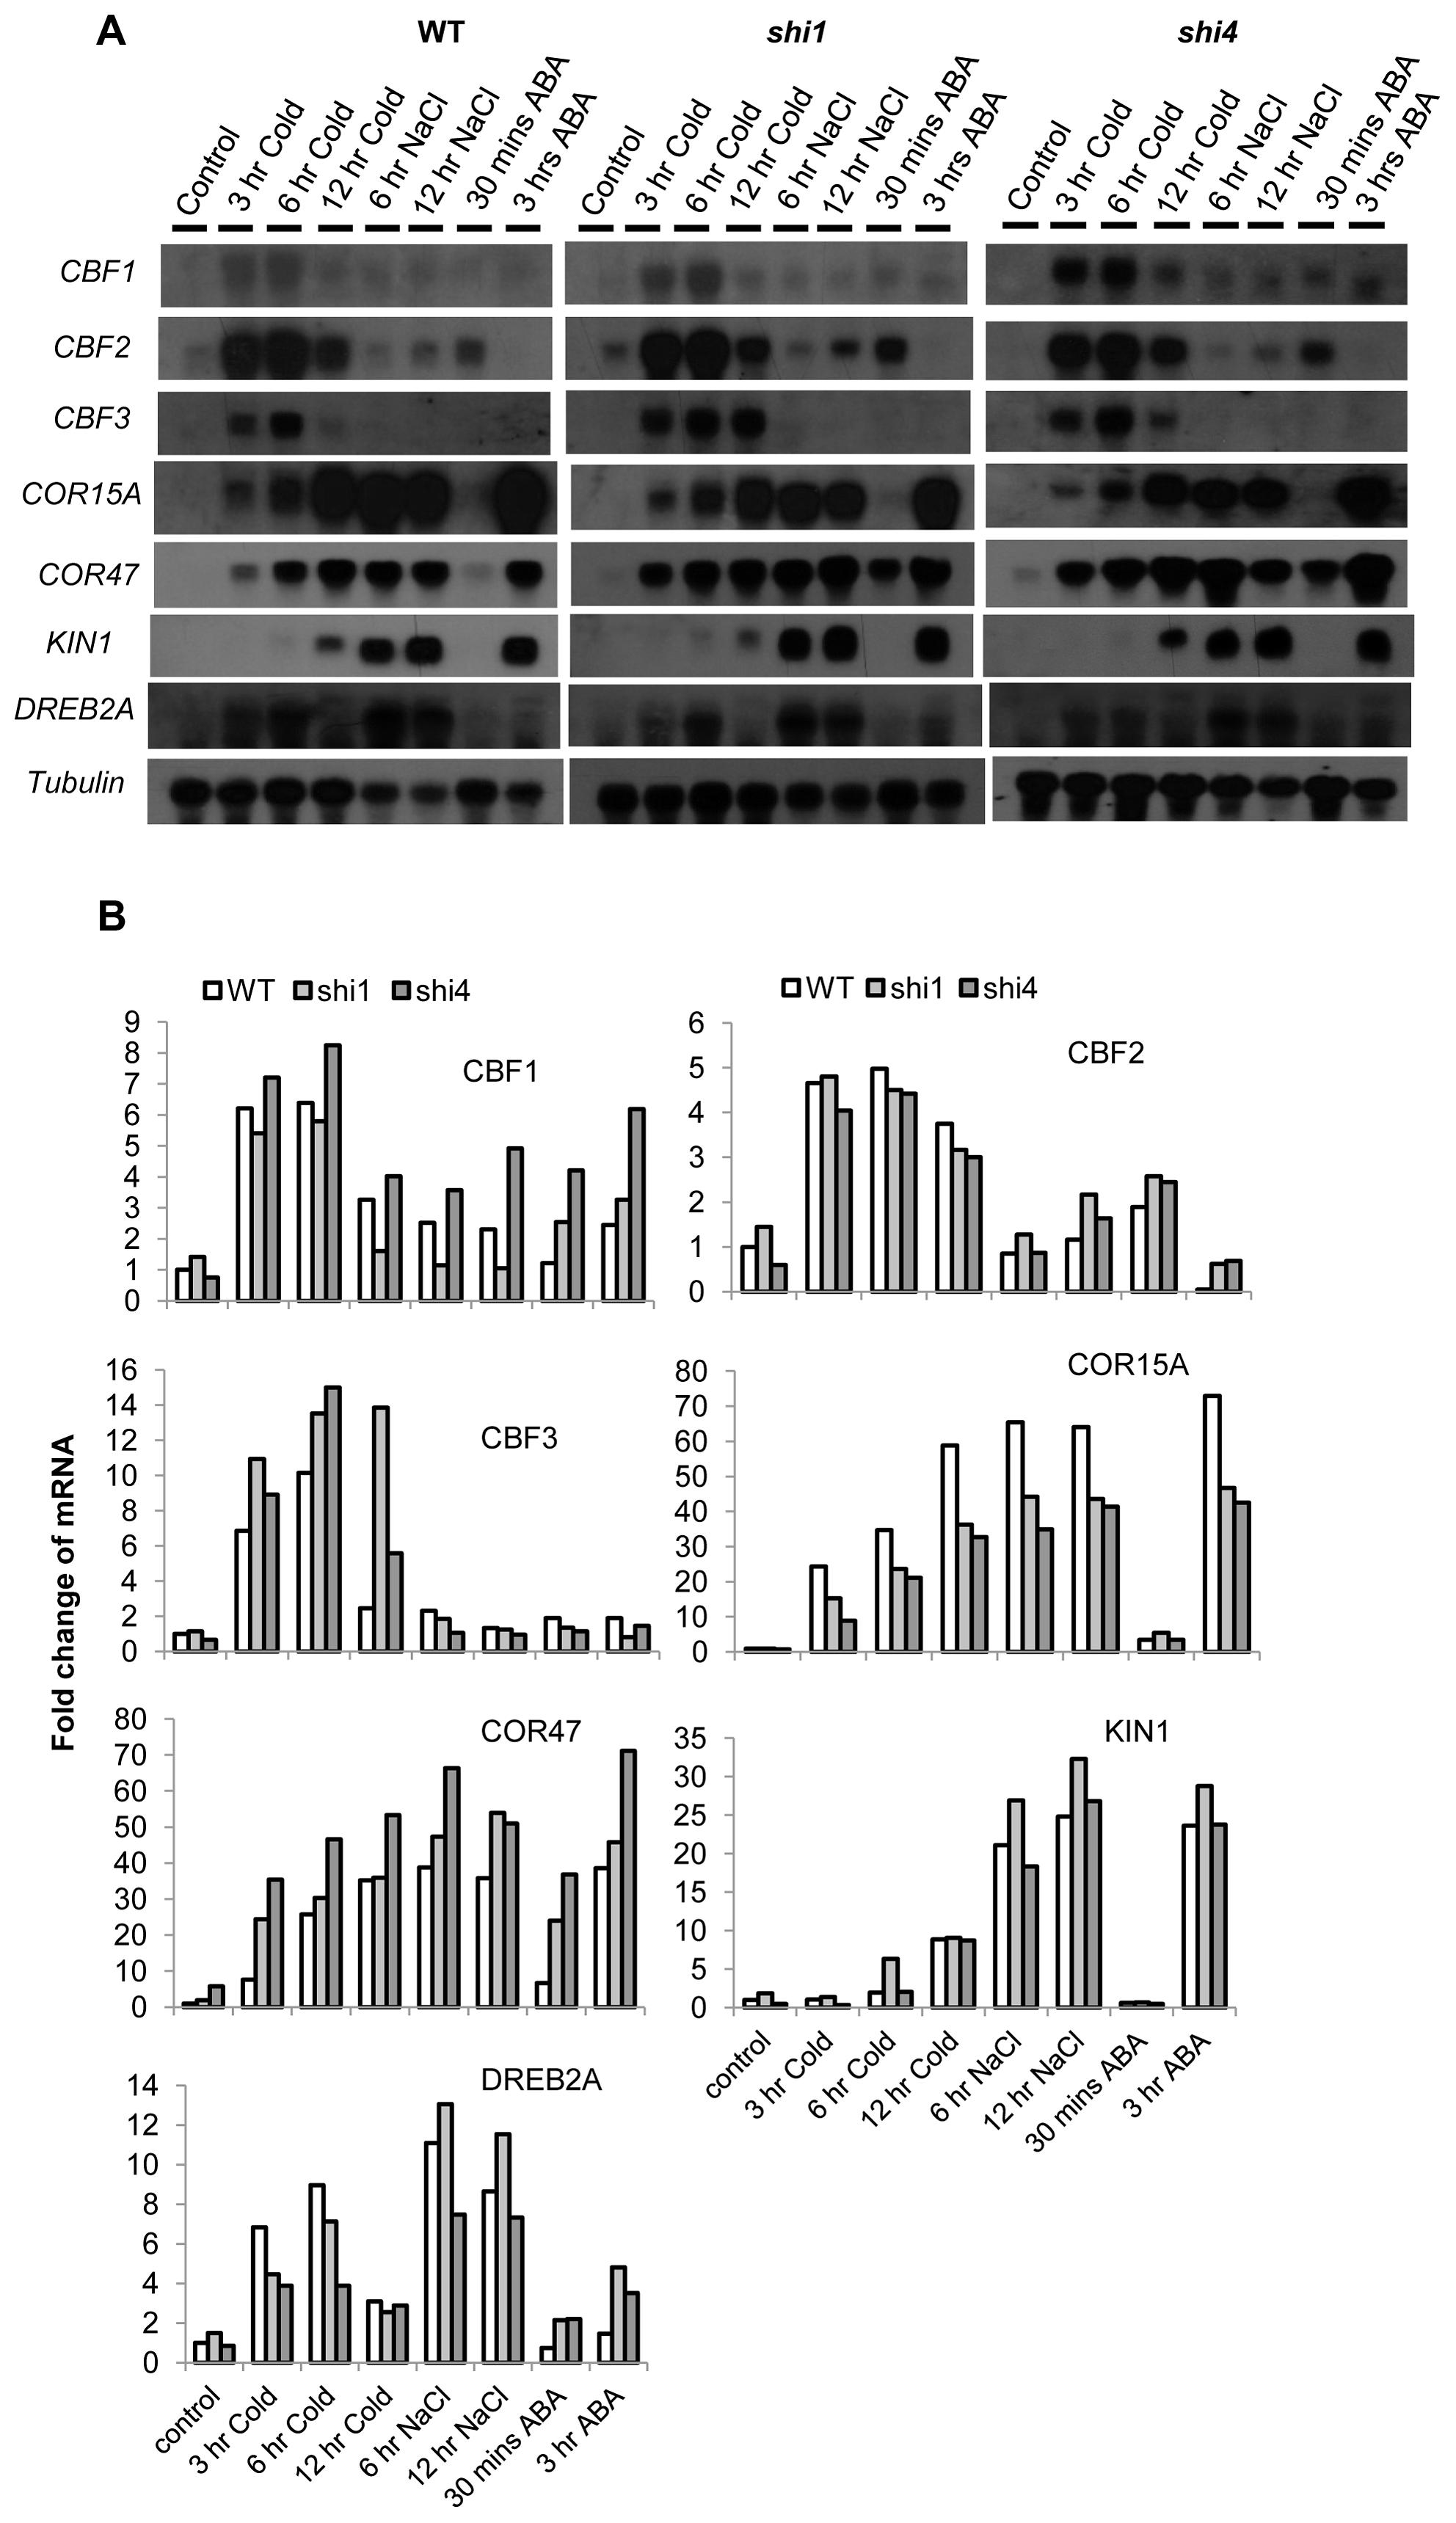 Detection of stress-inducible gene expression in wild type, <i>shi1</i> and <i>shi4</i> mutants.